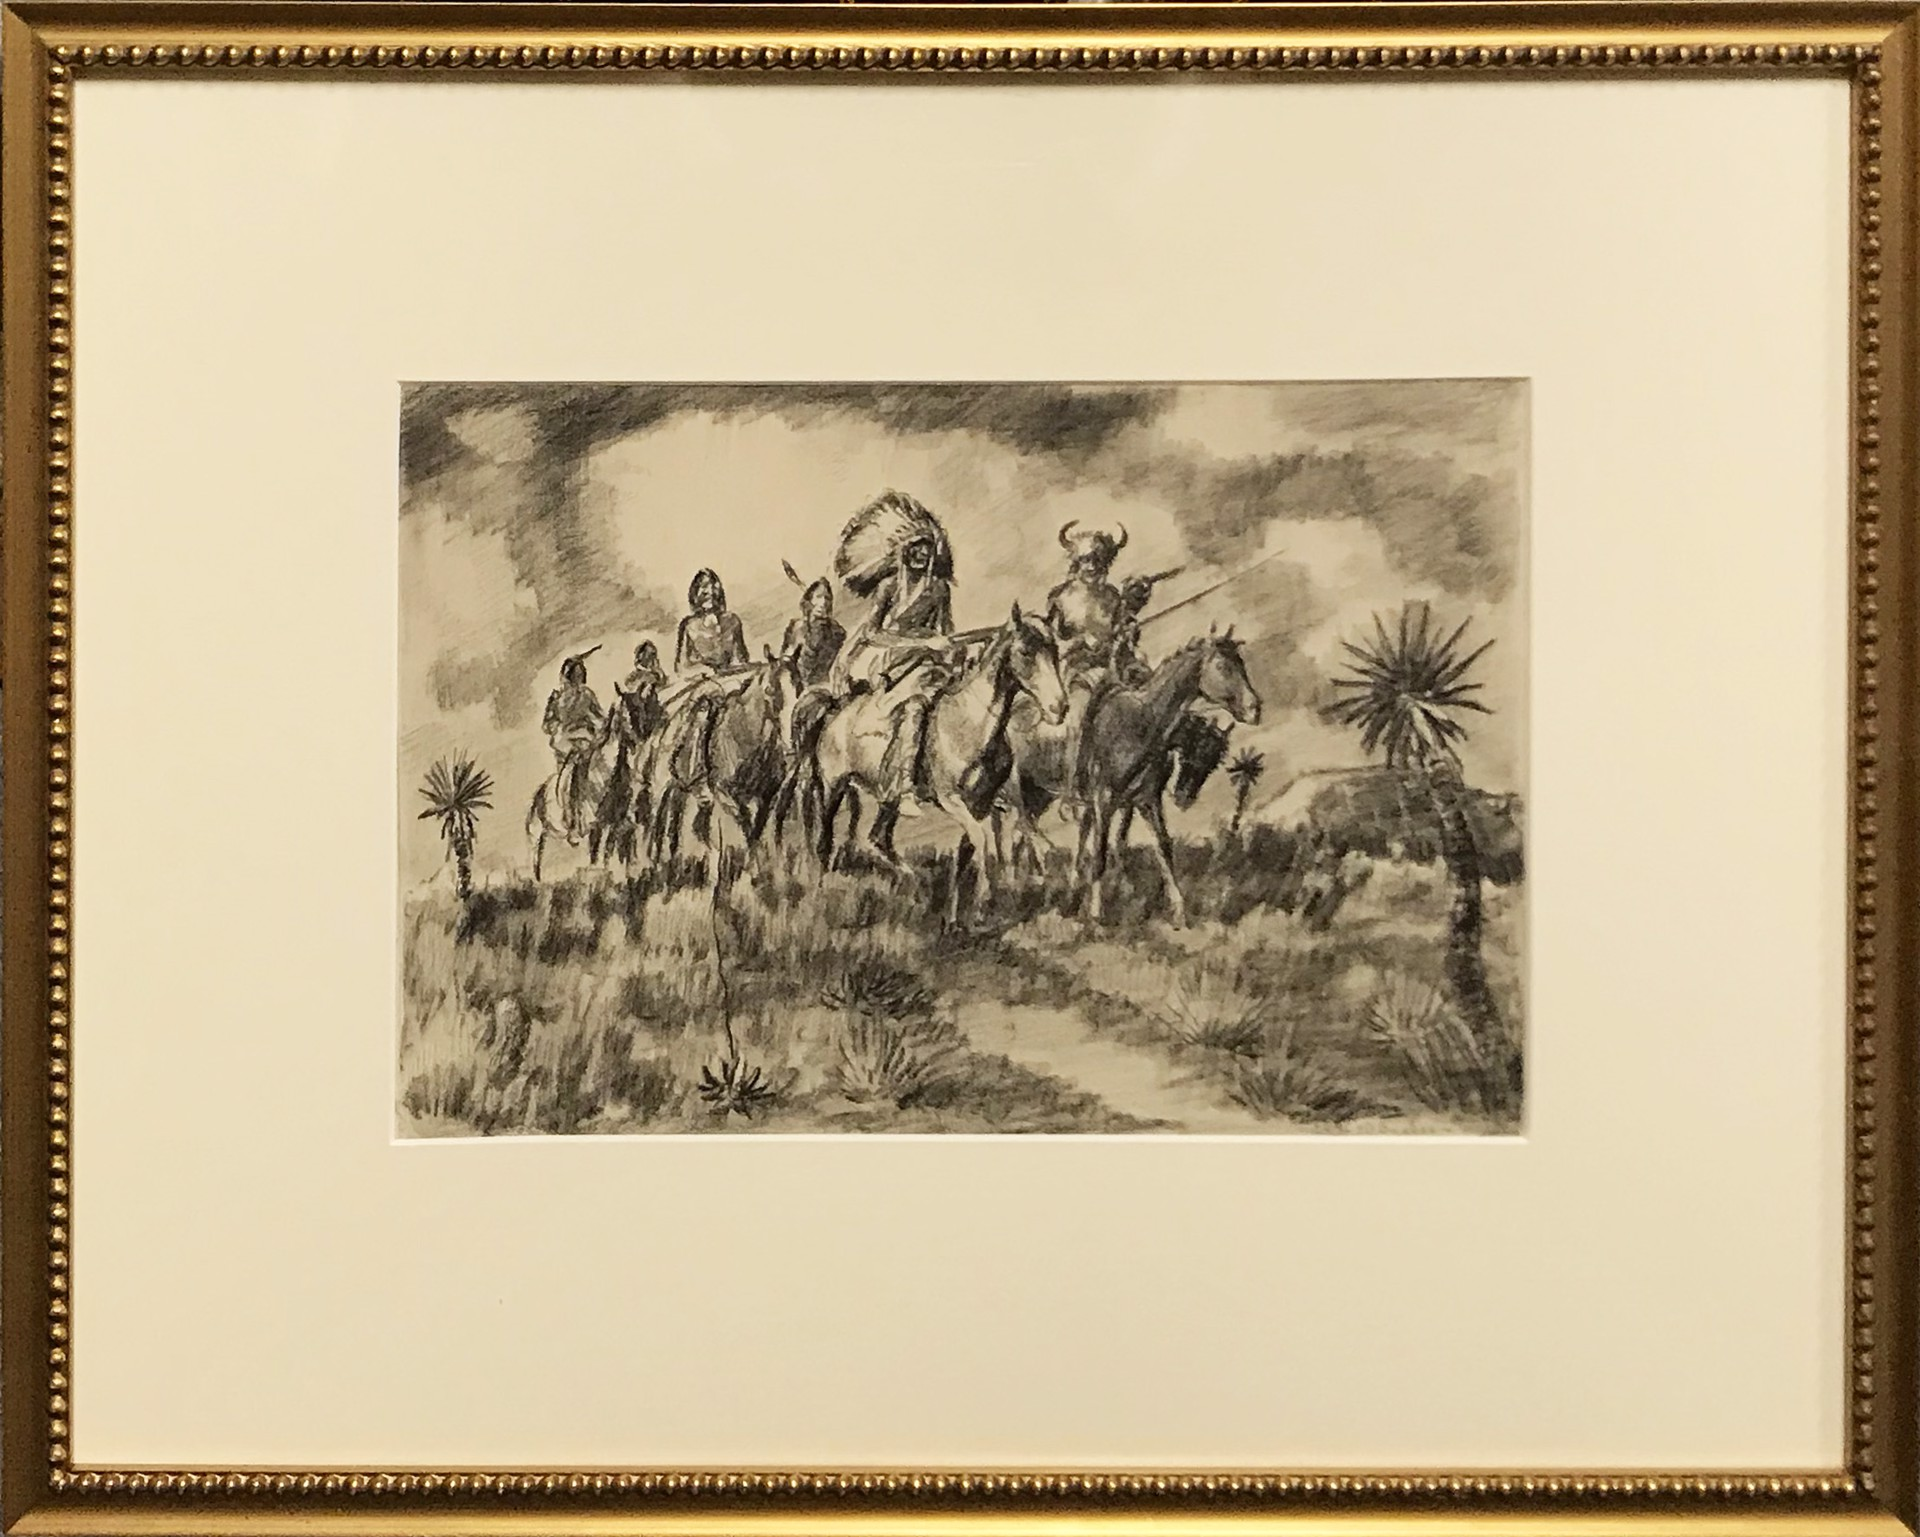 Indians on Horseback by Harold Bugbee